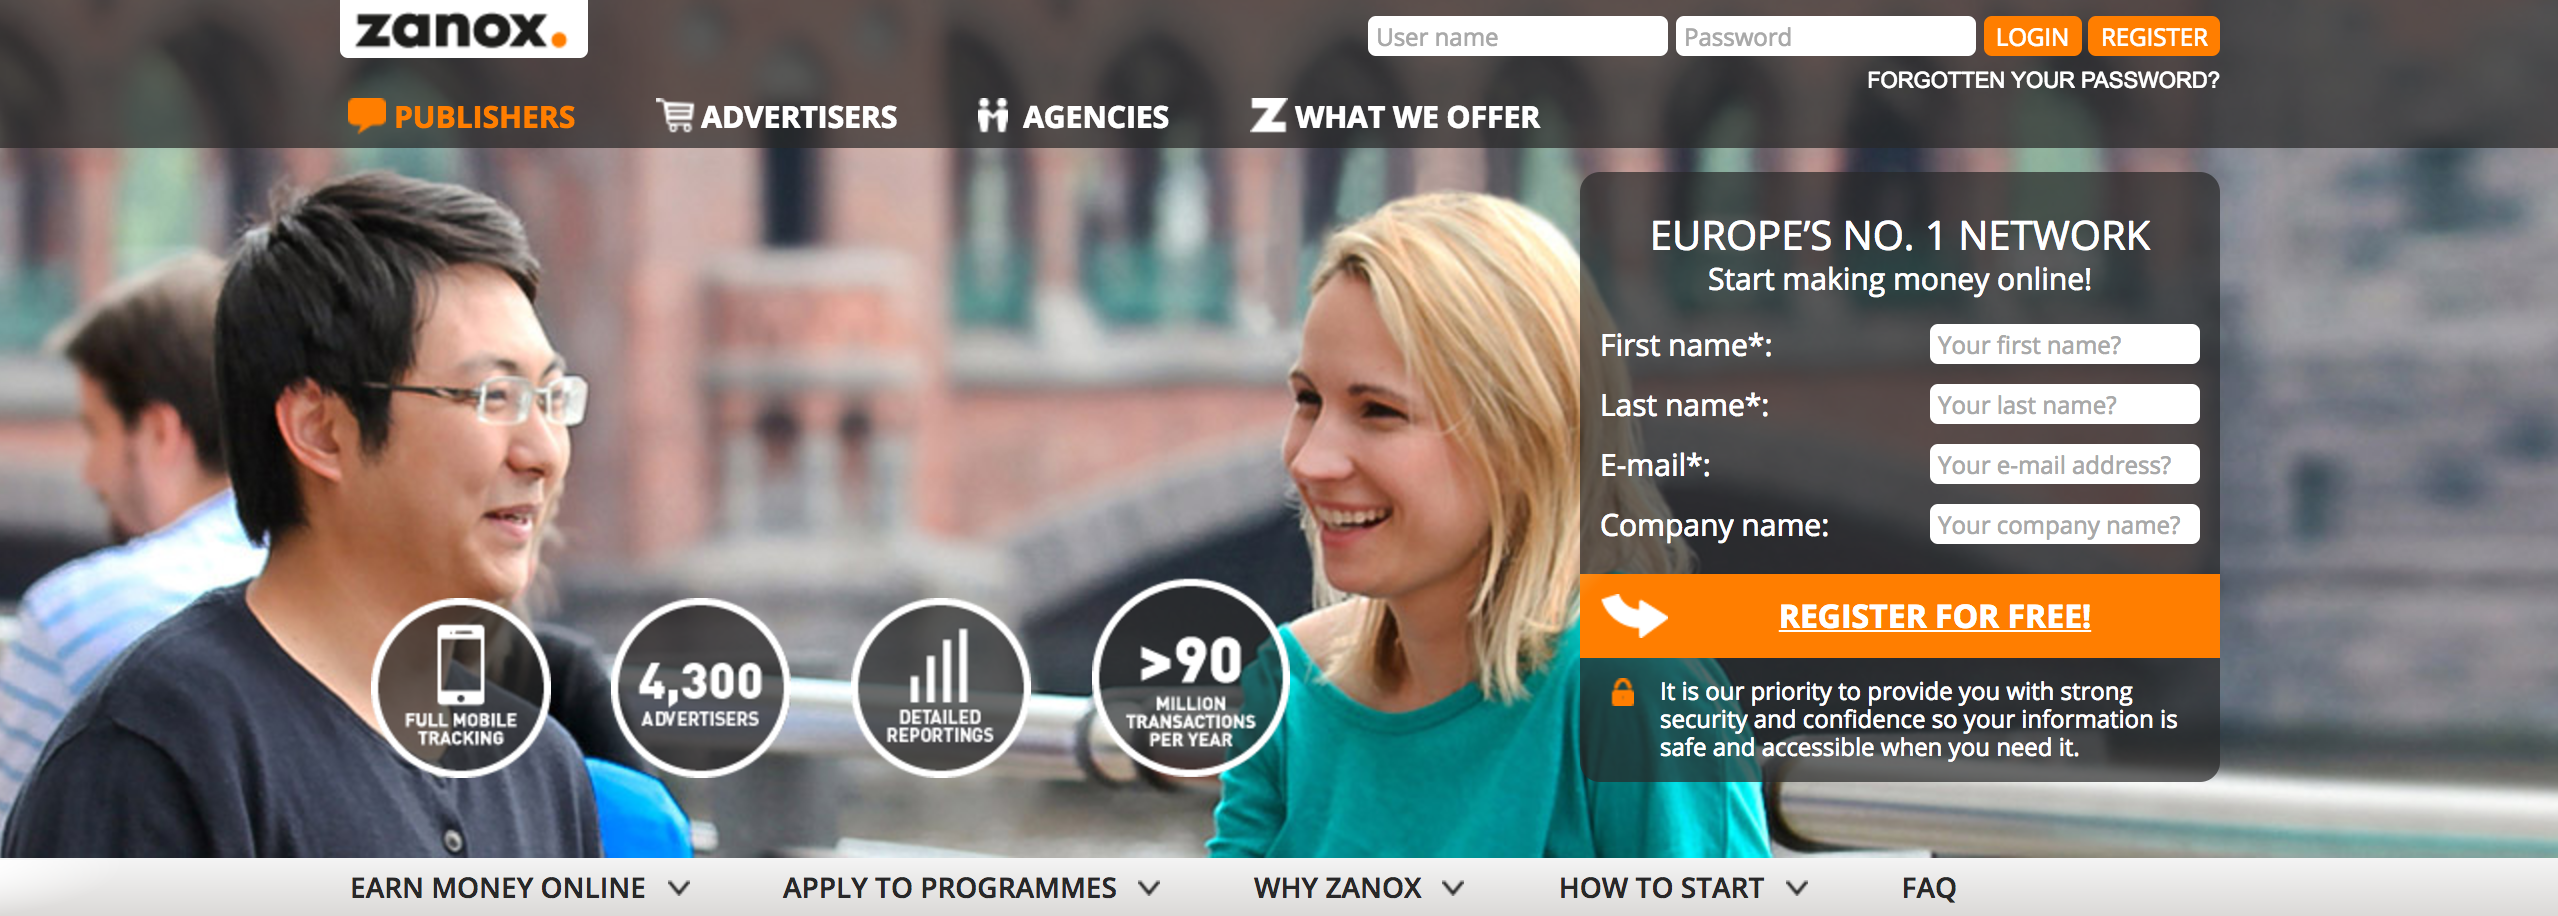 Zanox Network